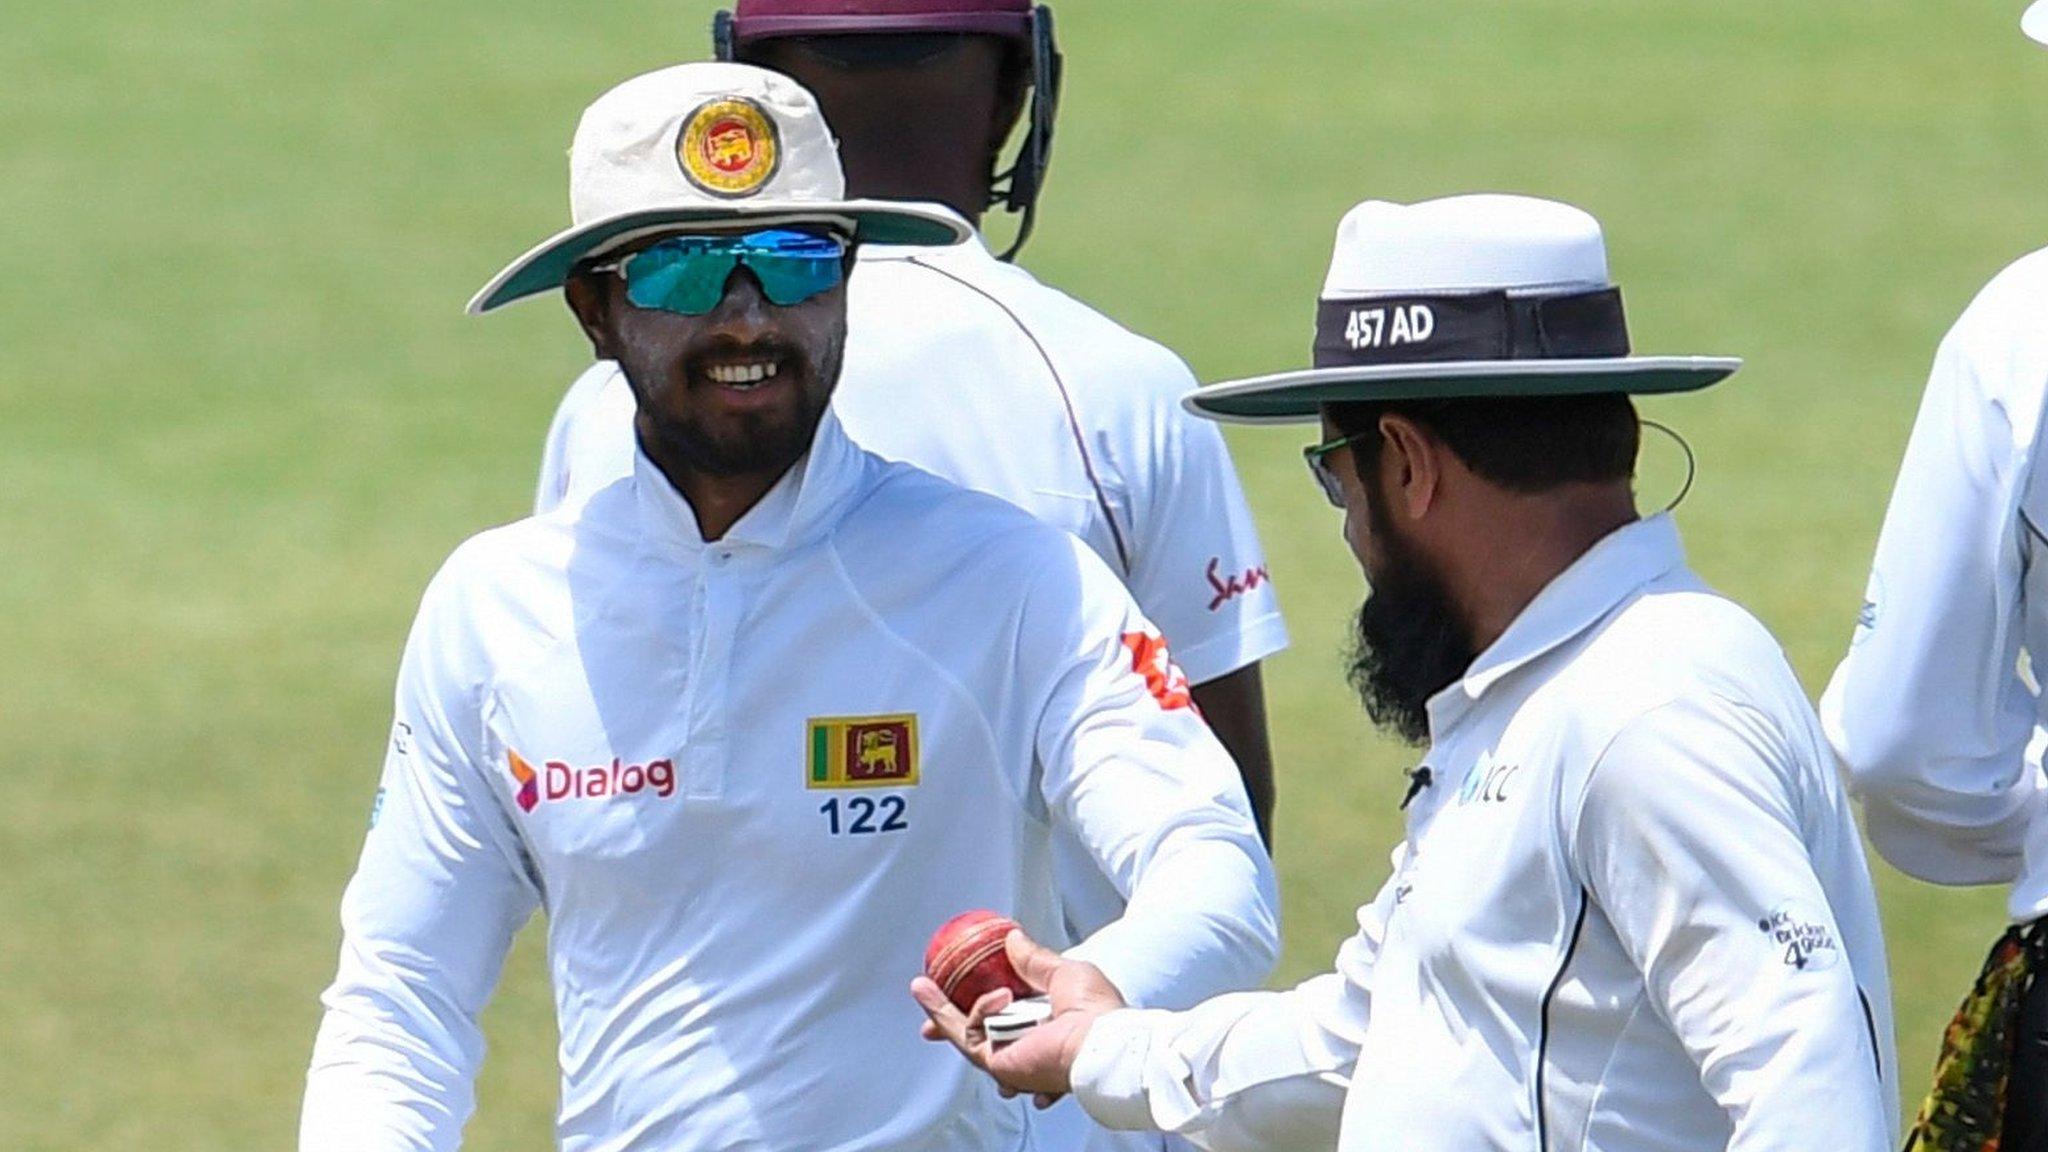 Sri Lanka captain Chandimal denies ball tampering charge